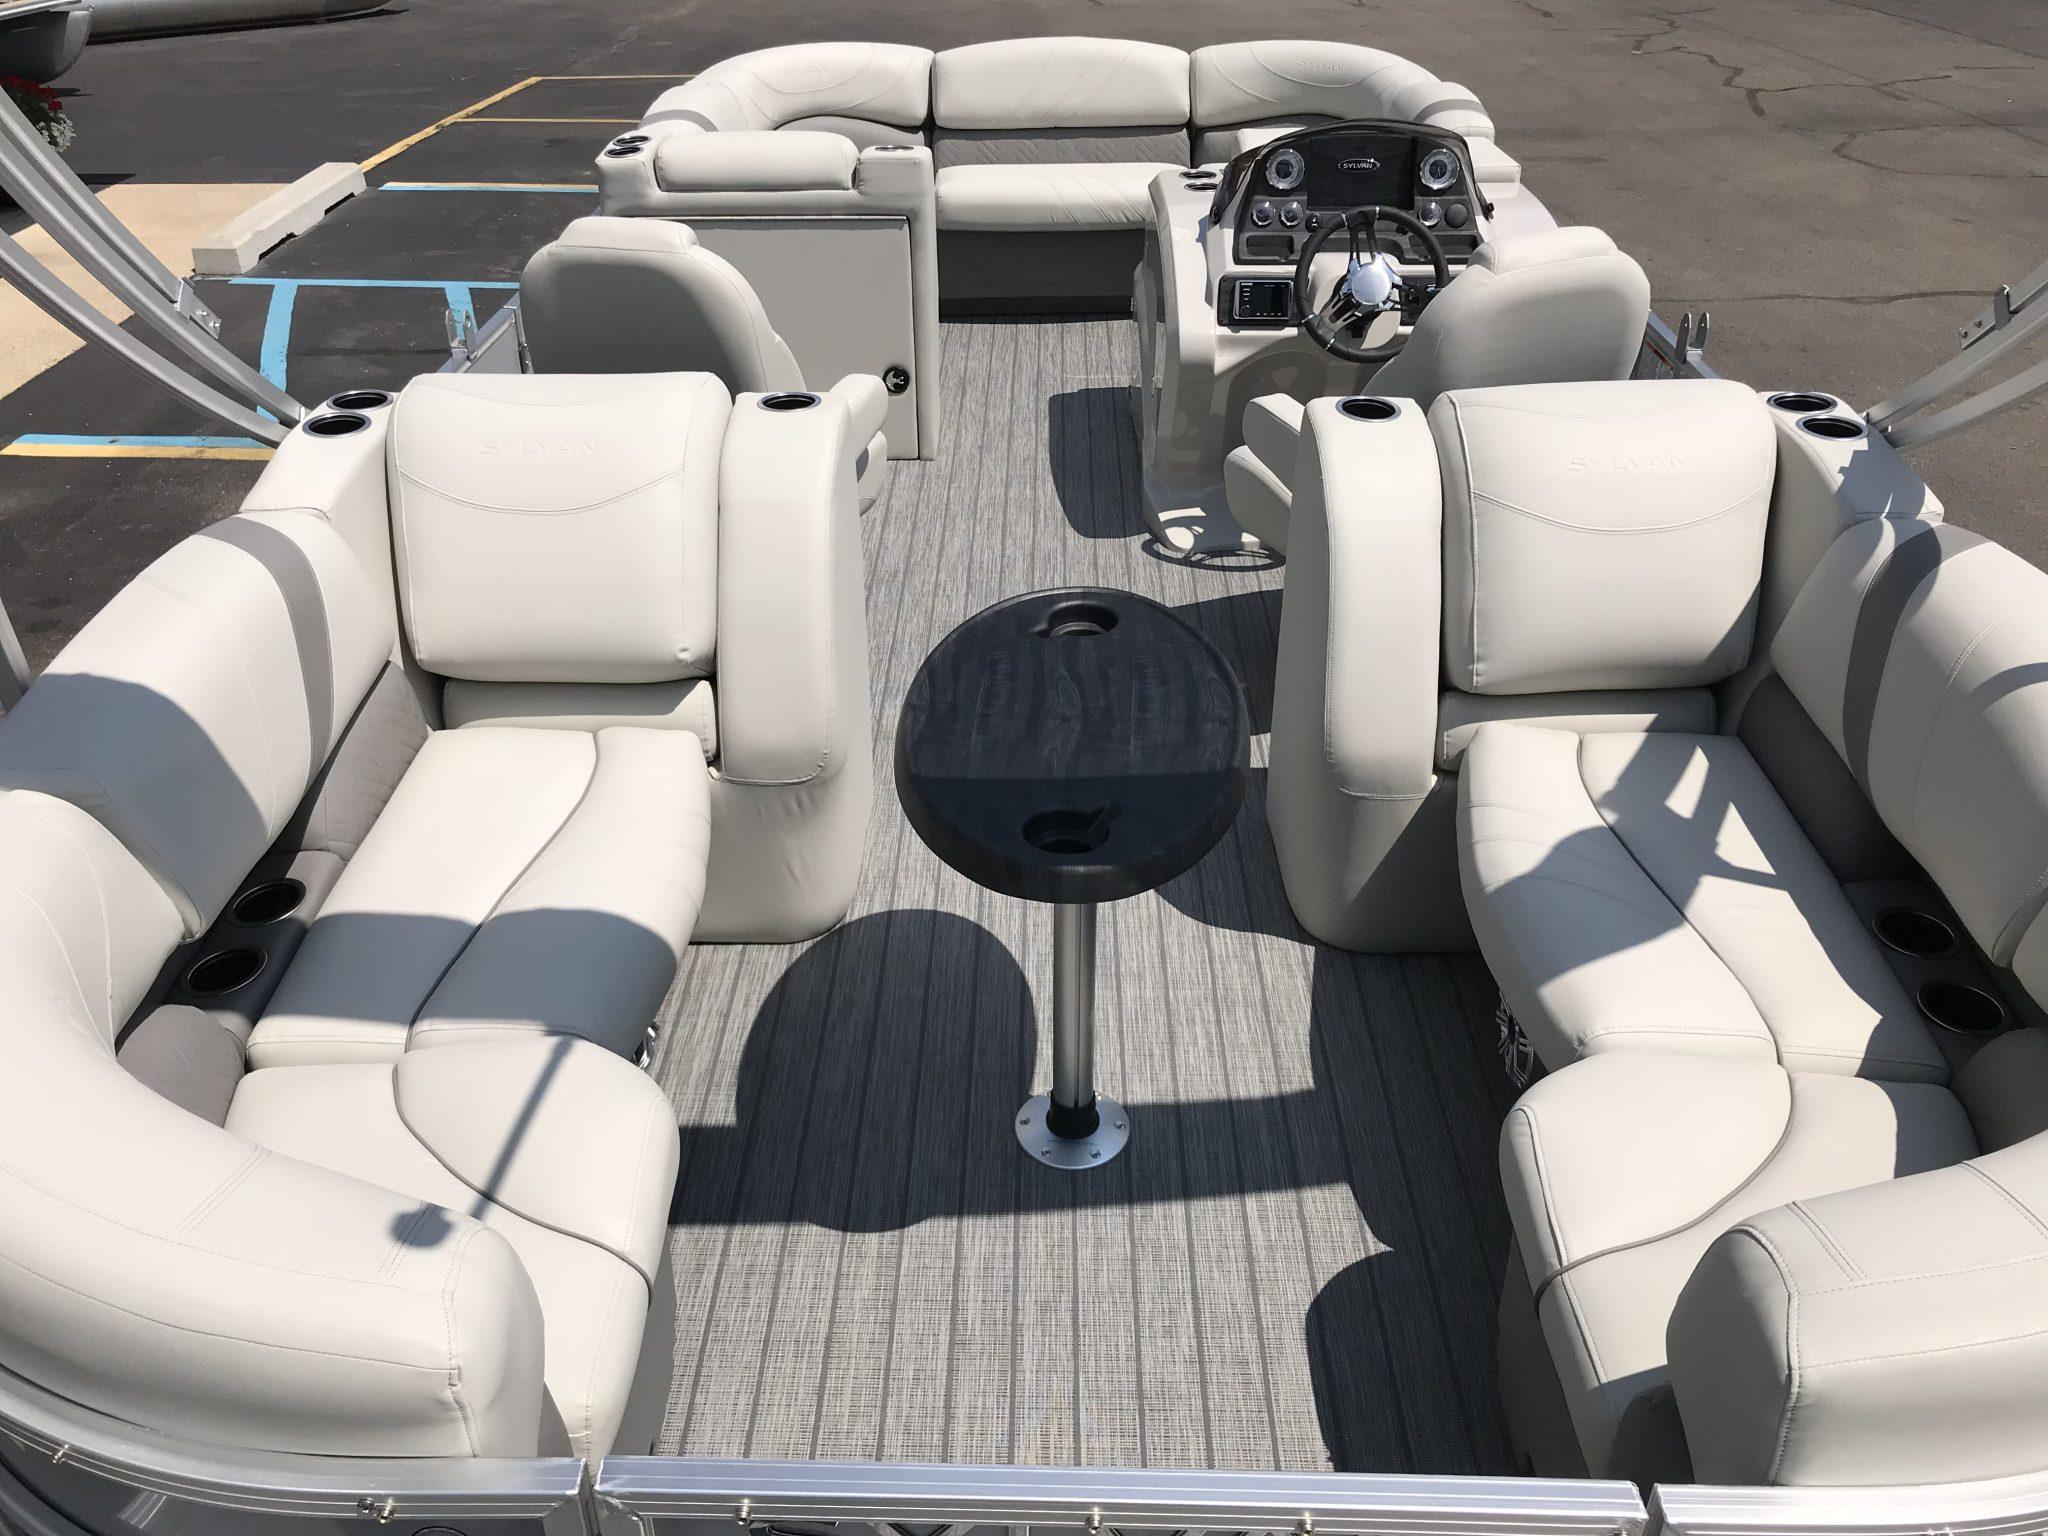 2019 Sylvan 8522 LZ LES Interior Cockpit Seating